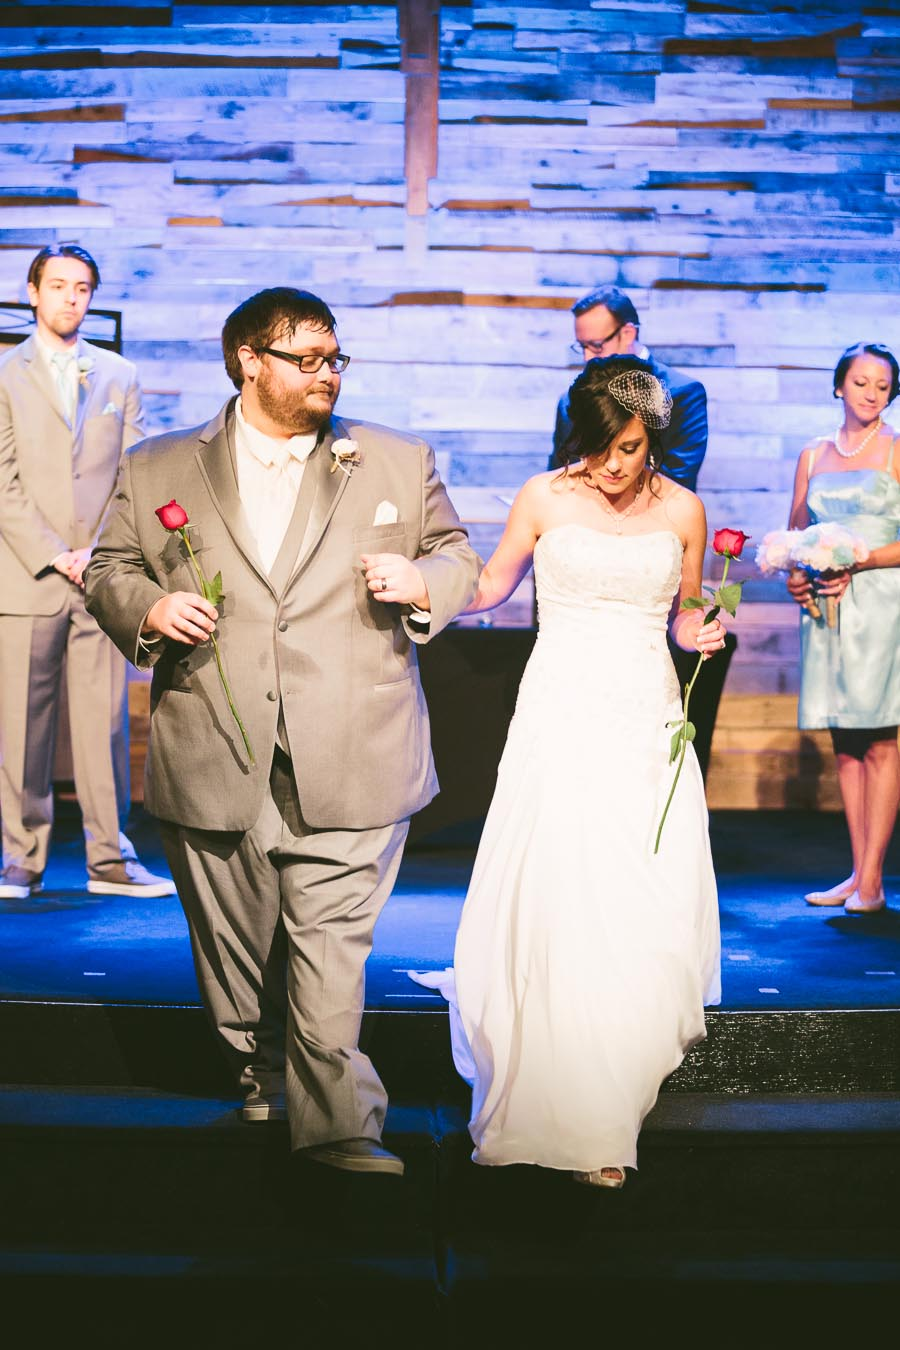 north-olmstead-wedding-photography-at-rubys-grafton-85.jpg